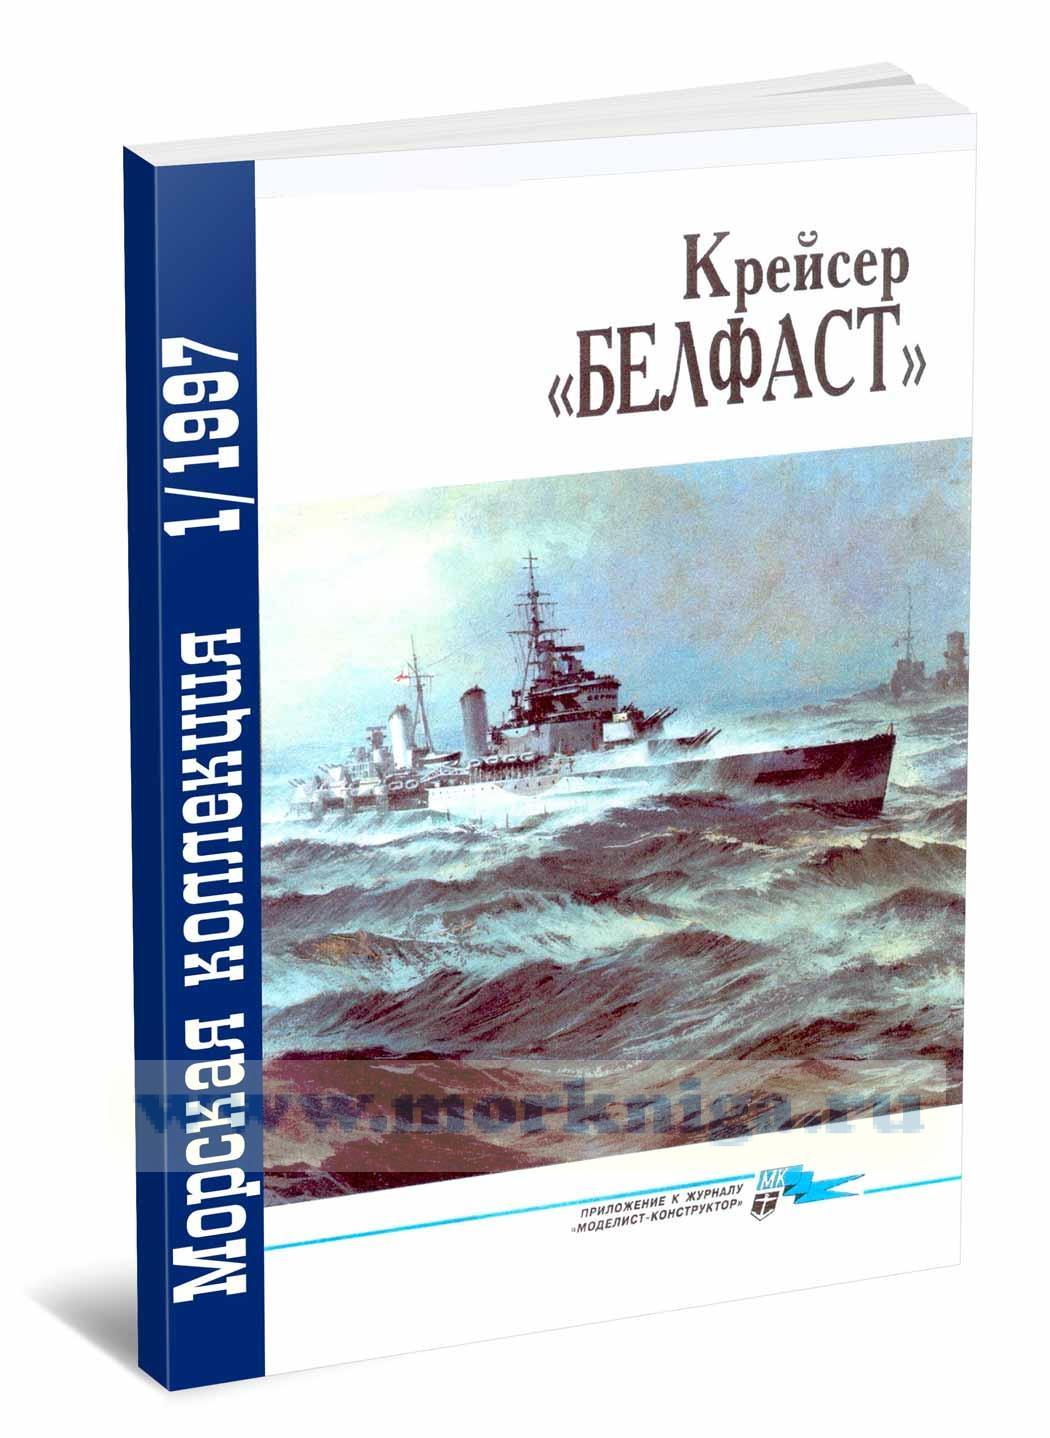 Крейсер «БЕЛФАСТ». Морская коллекция №1 (1997)